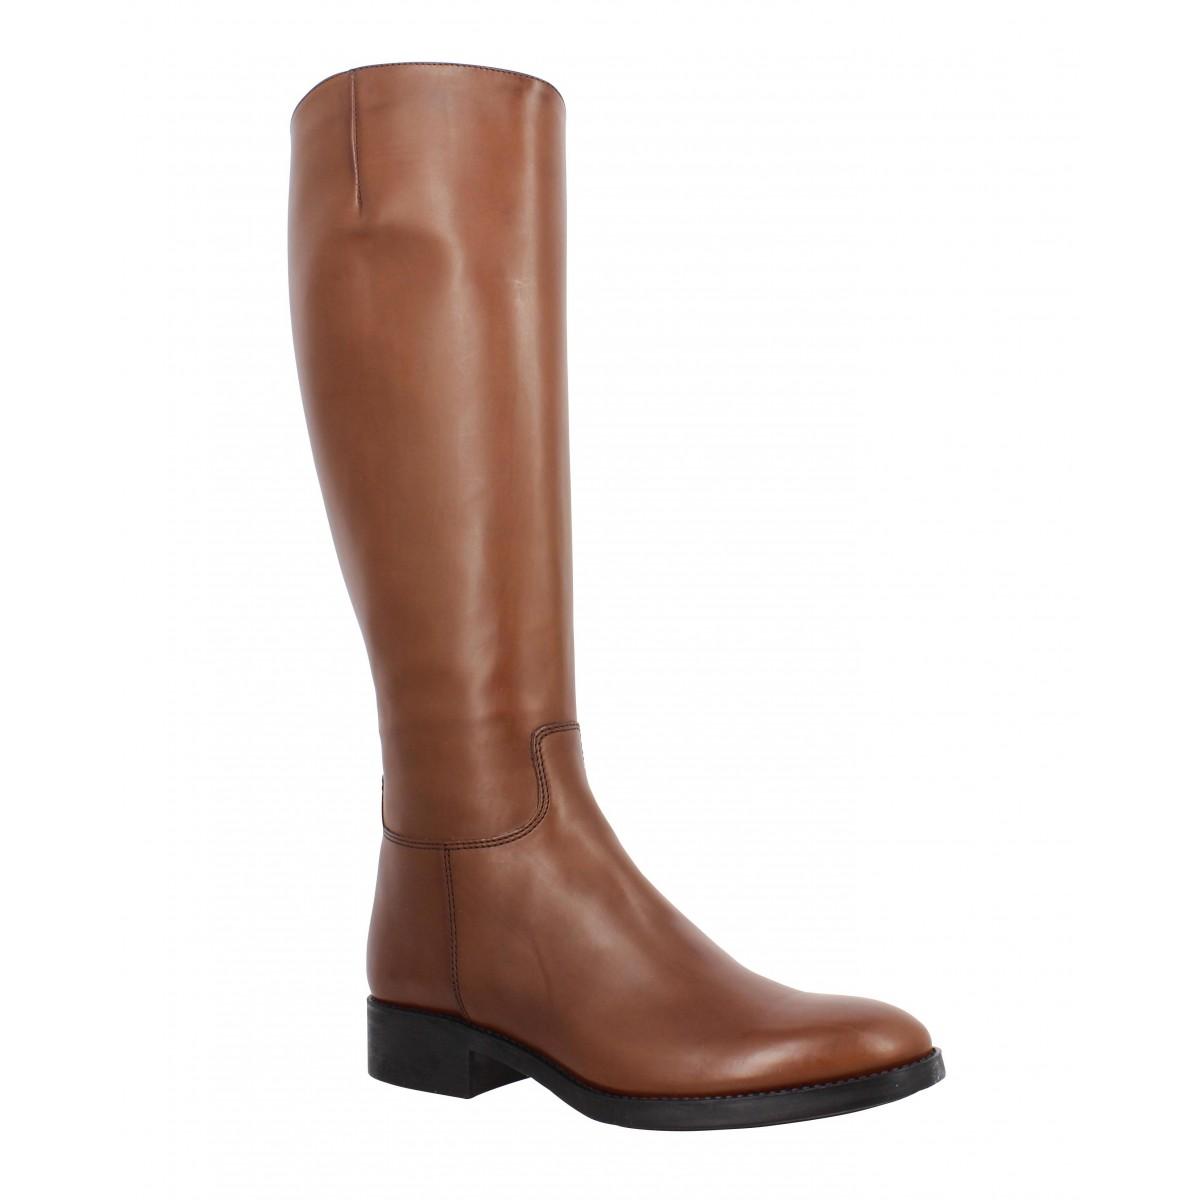 cuir 22 femme flight cognac chaussures Triver 920 Fanny qtwZCH